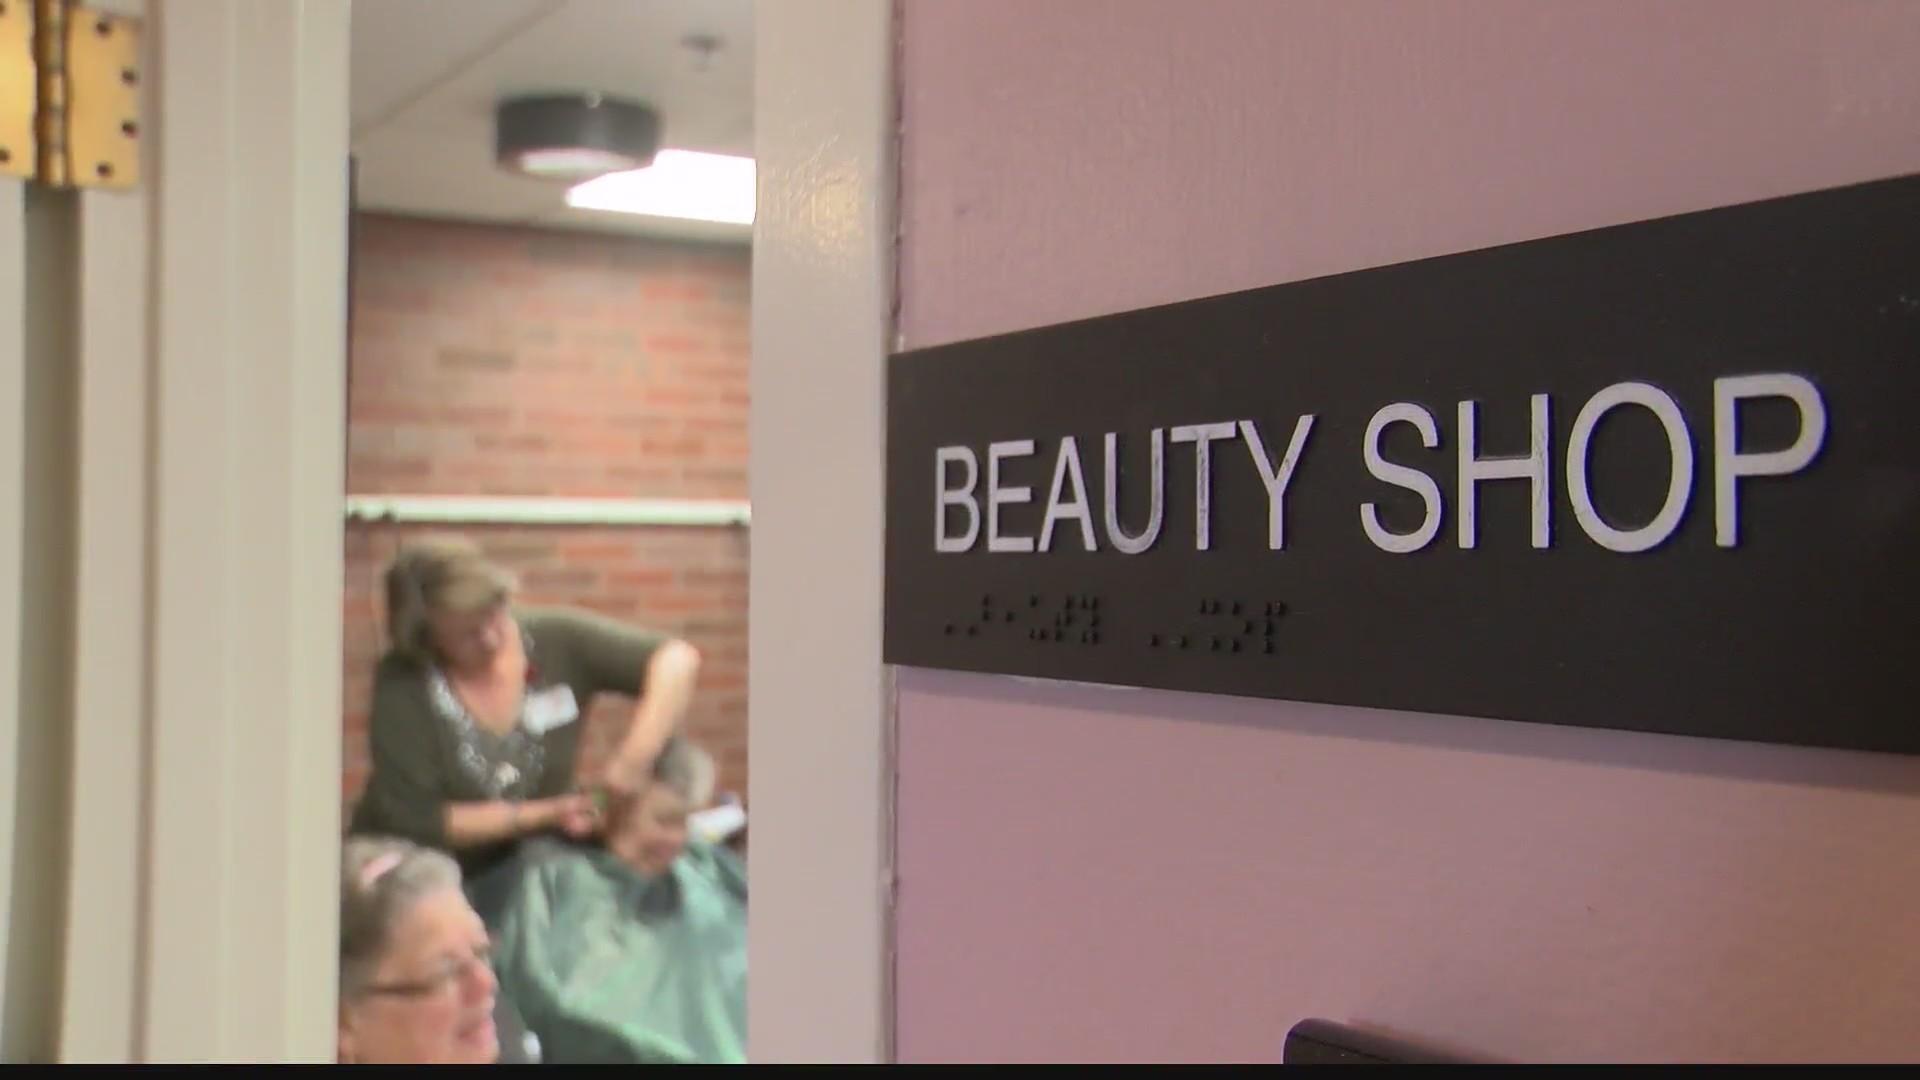 Free beauty shop at Centre Crest